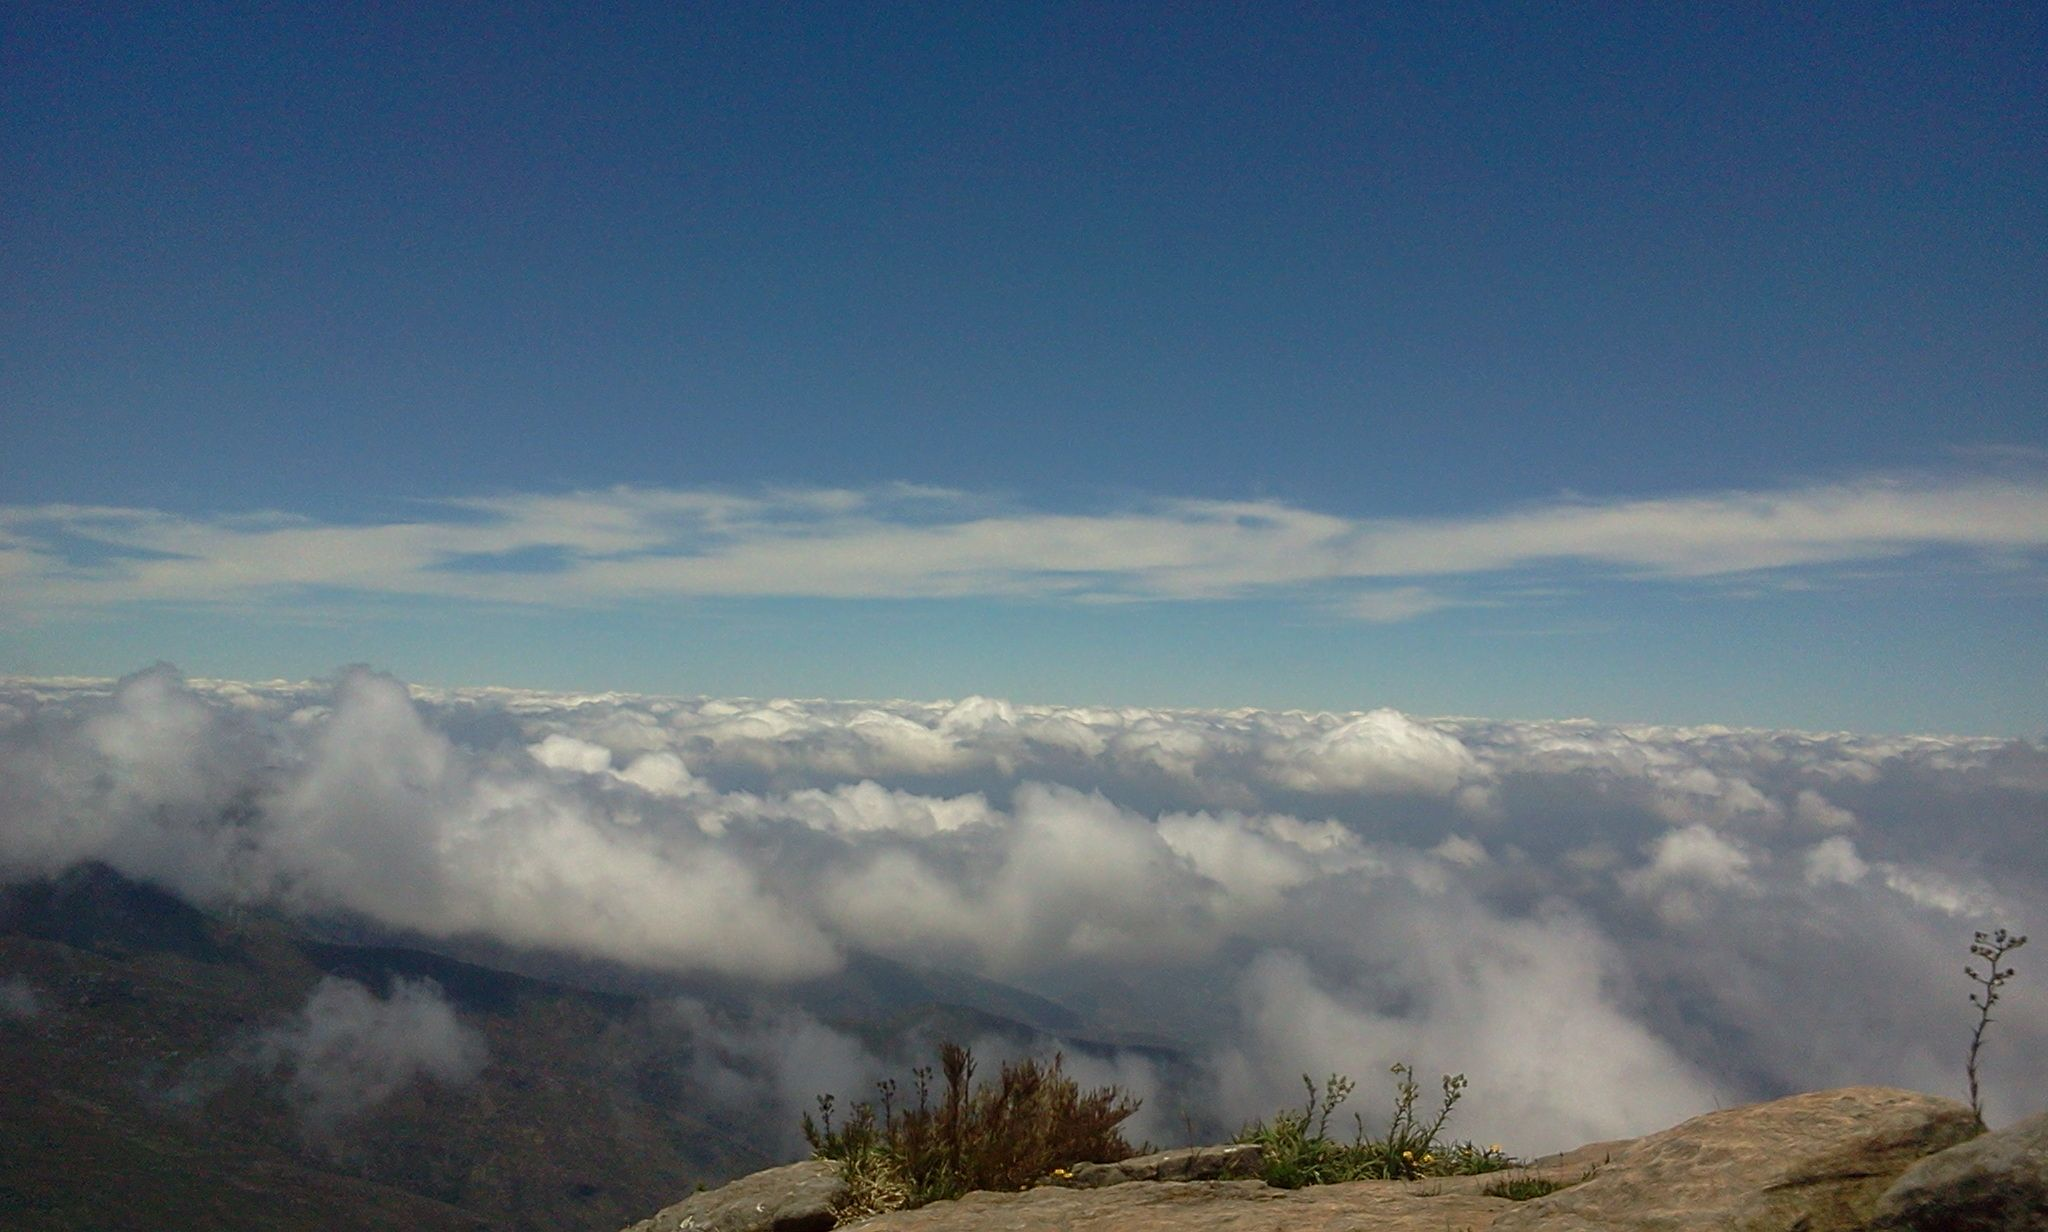 Alto do Caparaó, Minas Gerais, rumo ao Pico da Bandeira